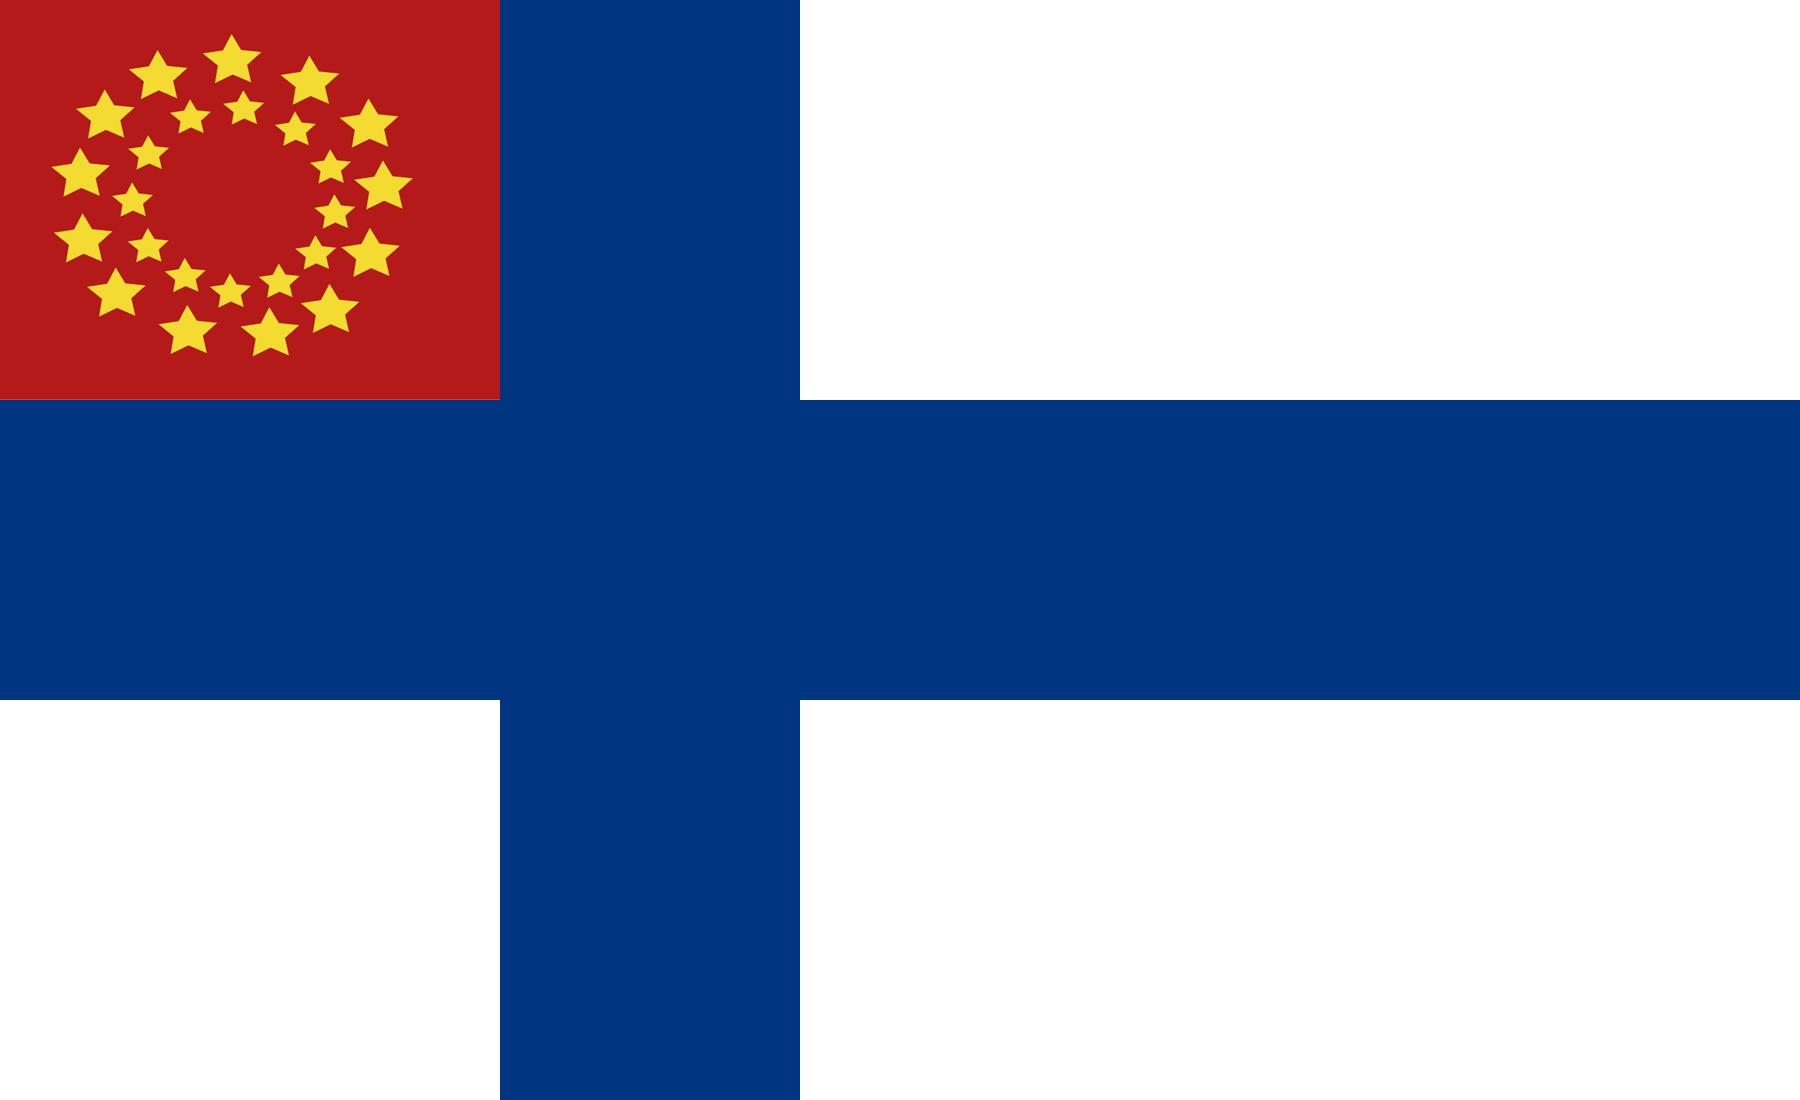 Euro-Suomi -liittovaltion lippu